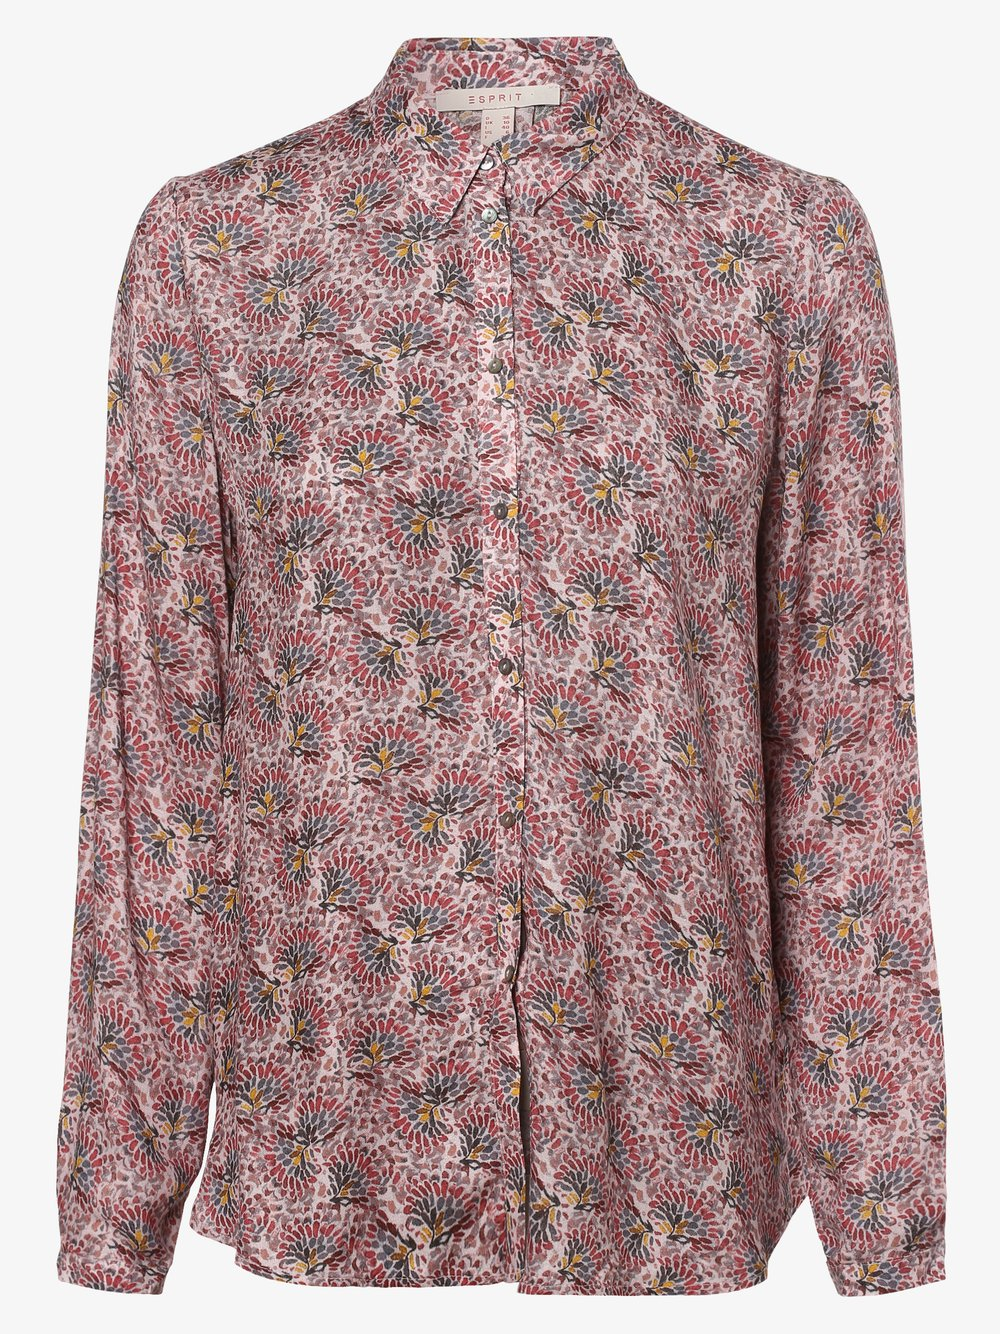 Esprit Casual – Bluzka damska, różowy Van Graaf 457318-0001